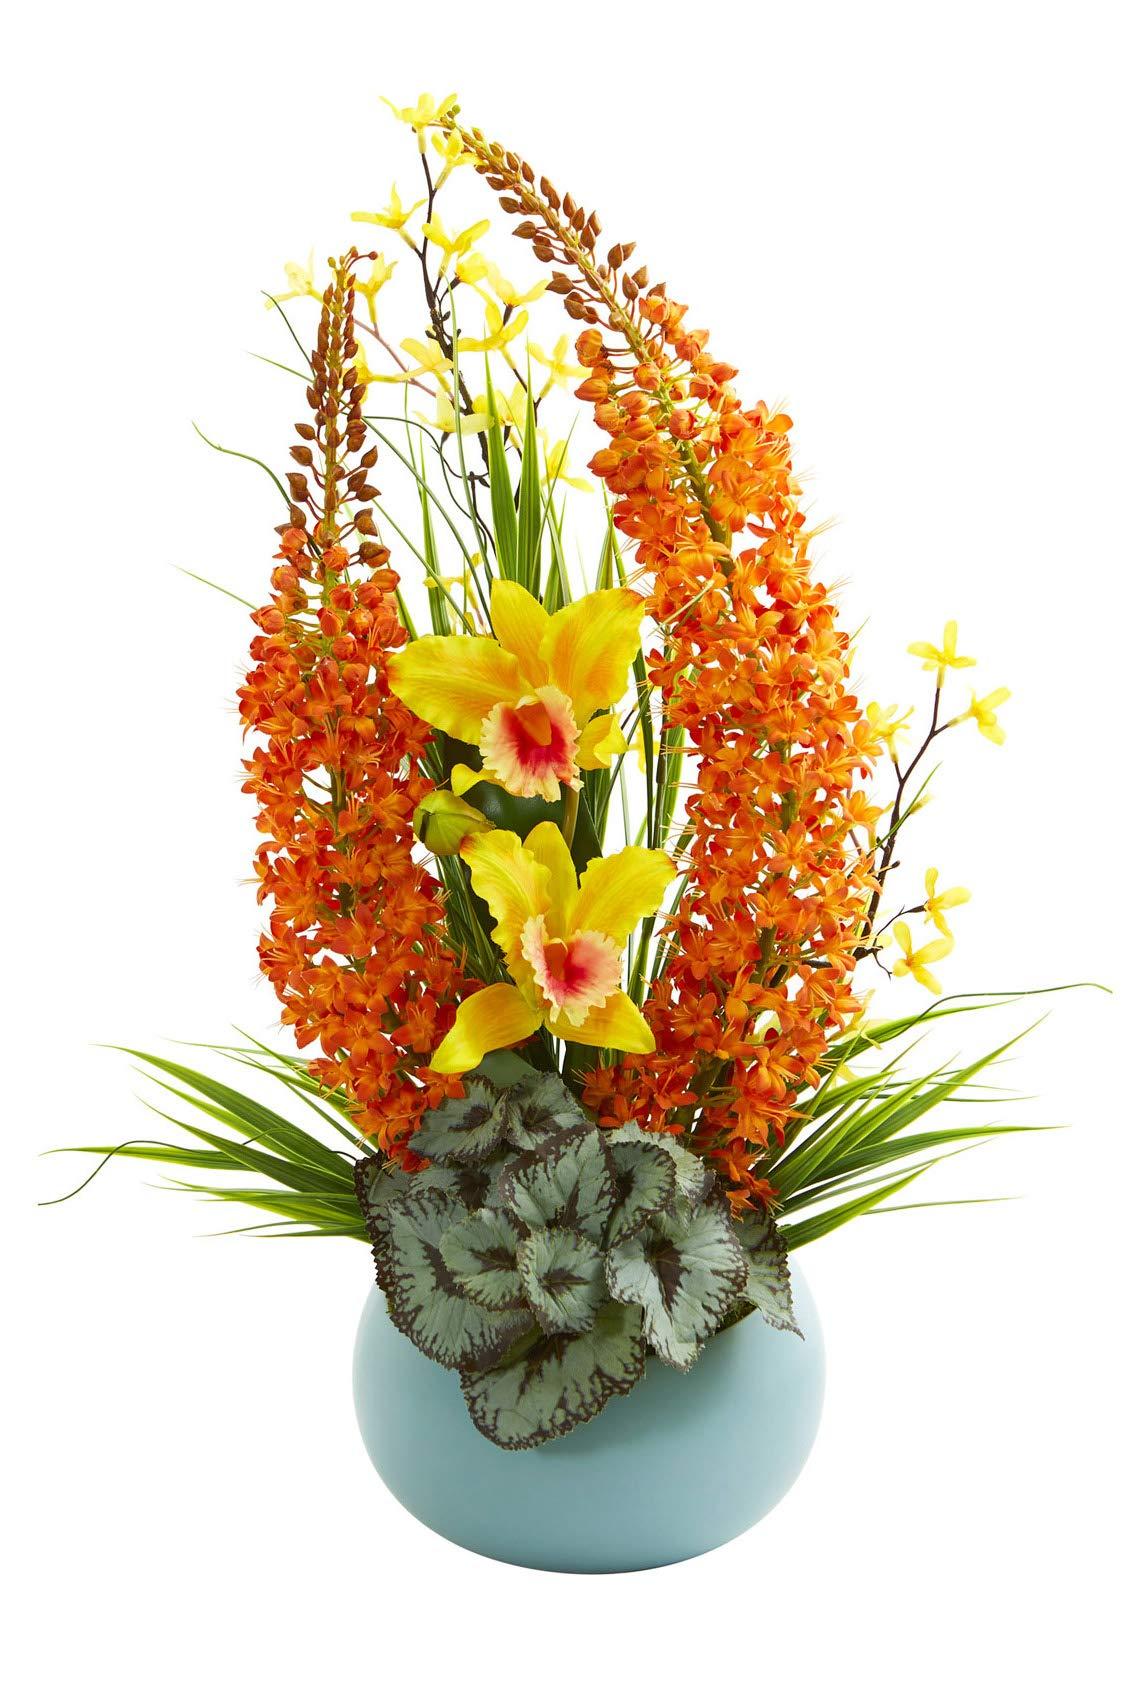 Silk Flowers 23 Inch Cattleya Orchid And Fox Tail Arrangement With Blue Vase Artificial Flowers Silk Flower Arrangements